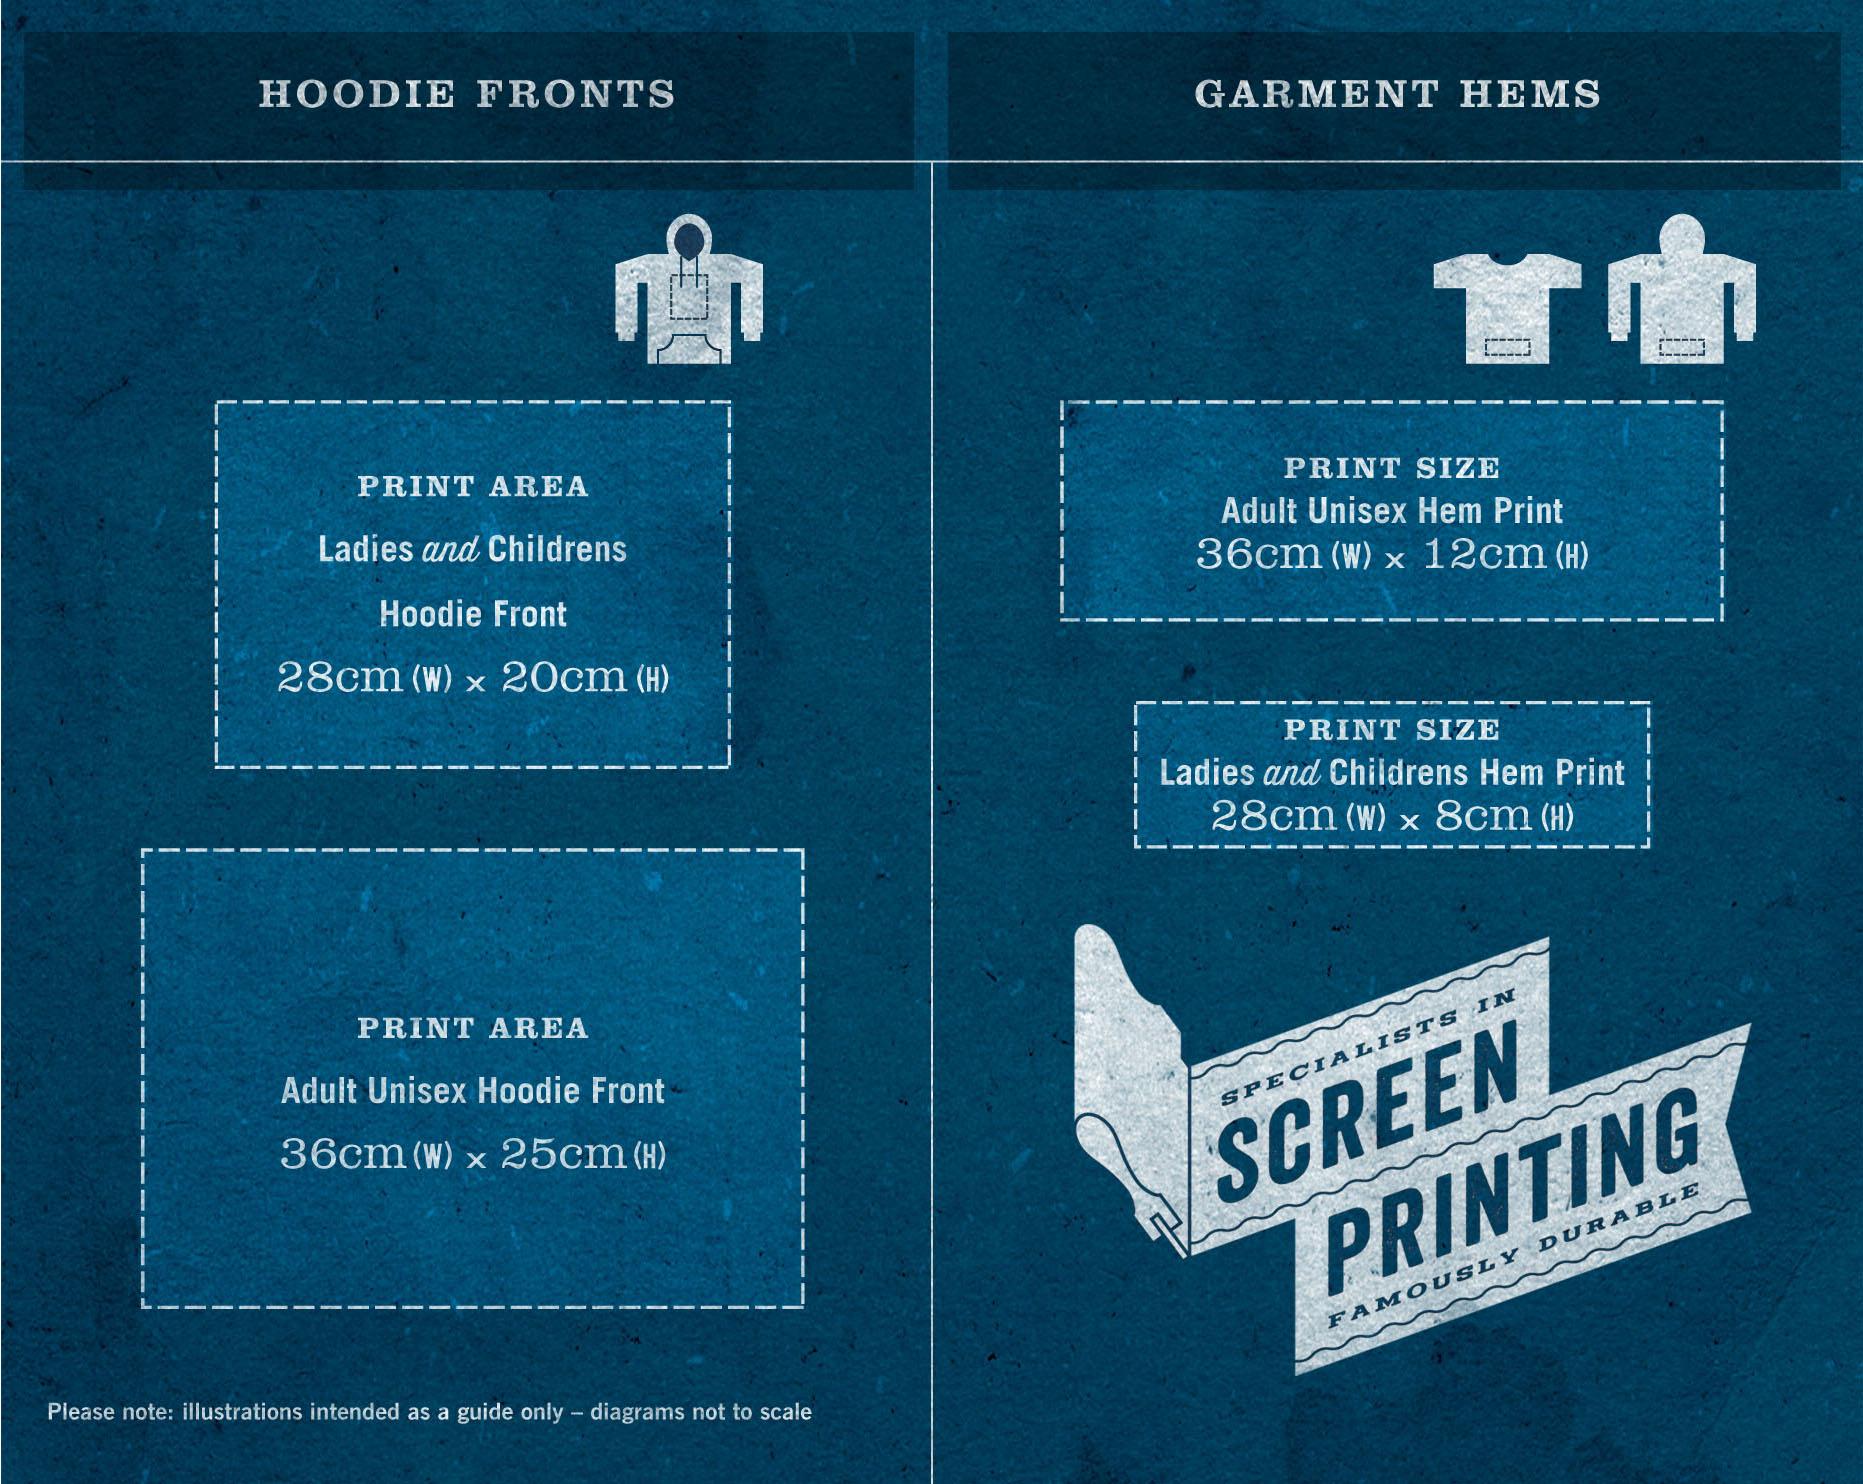 LL-print-sizes-03.jpg